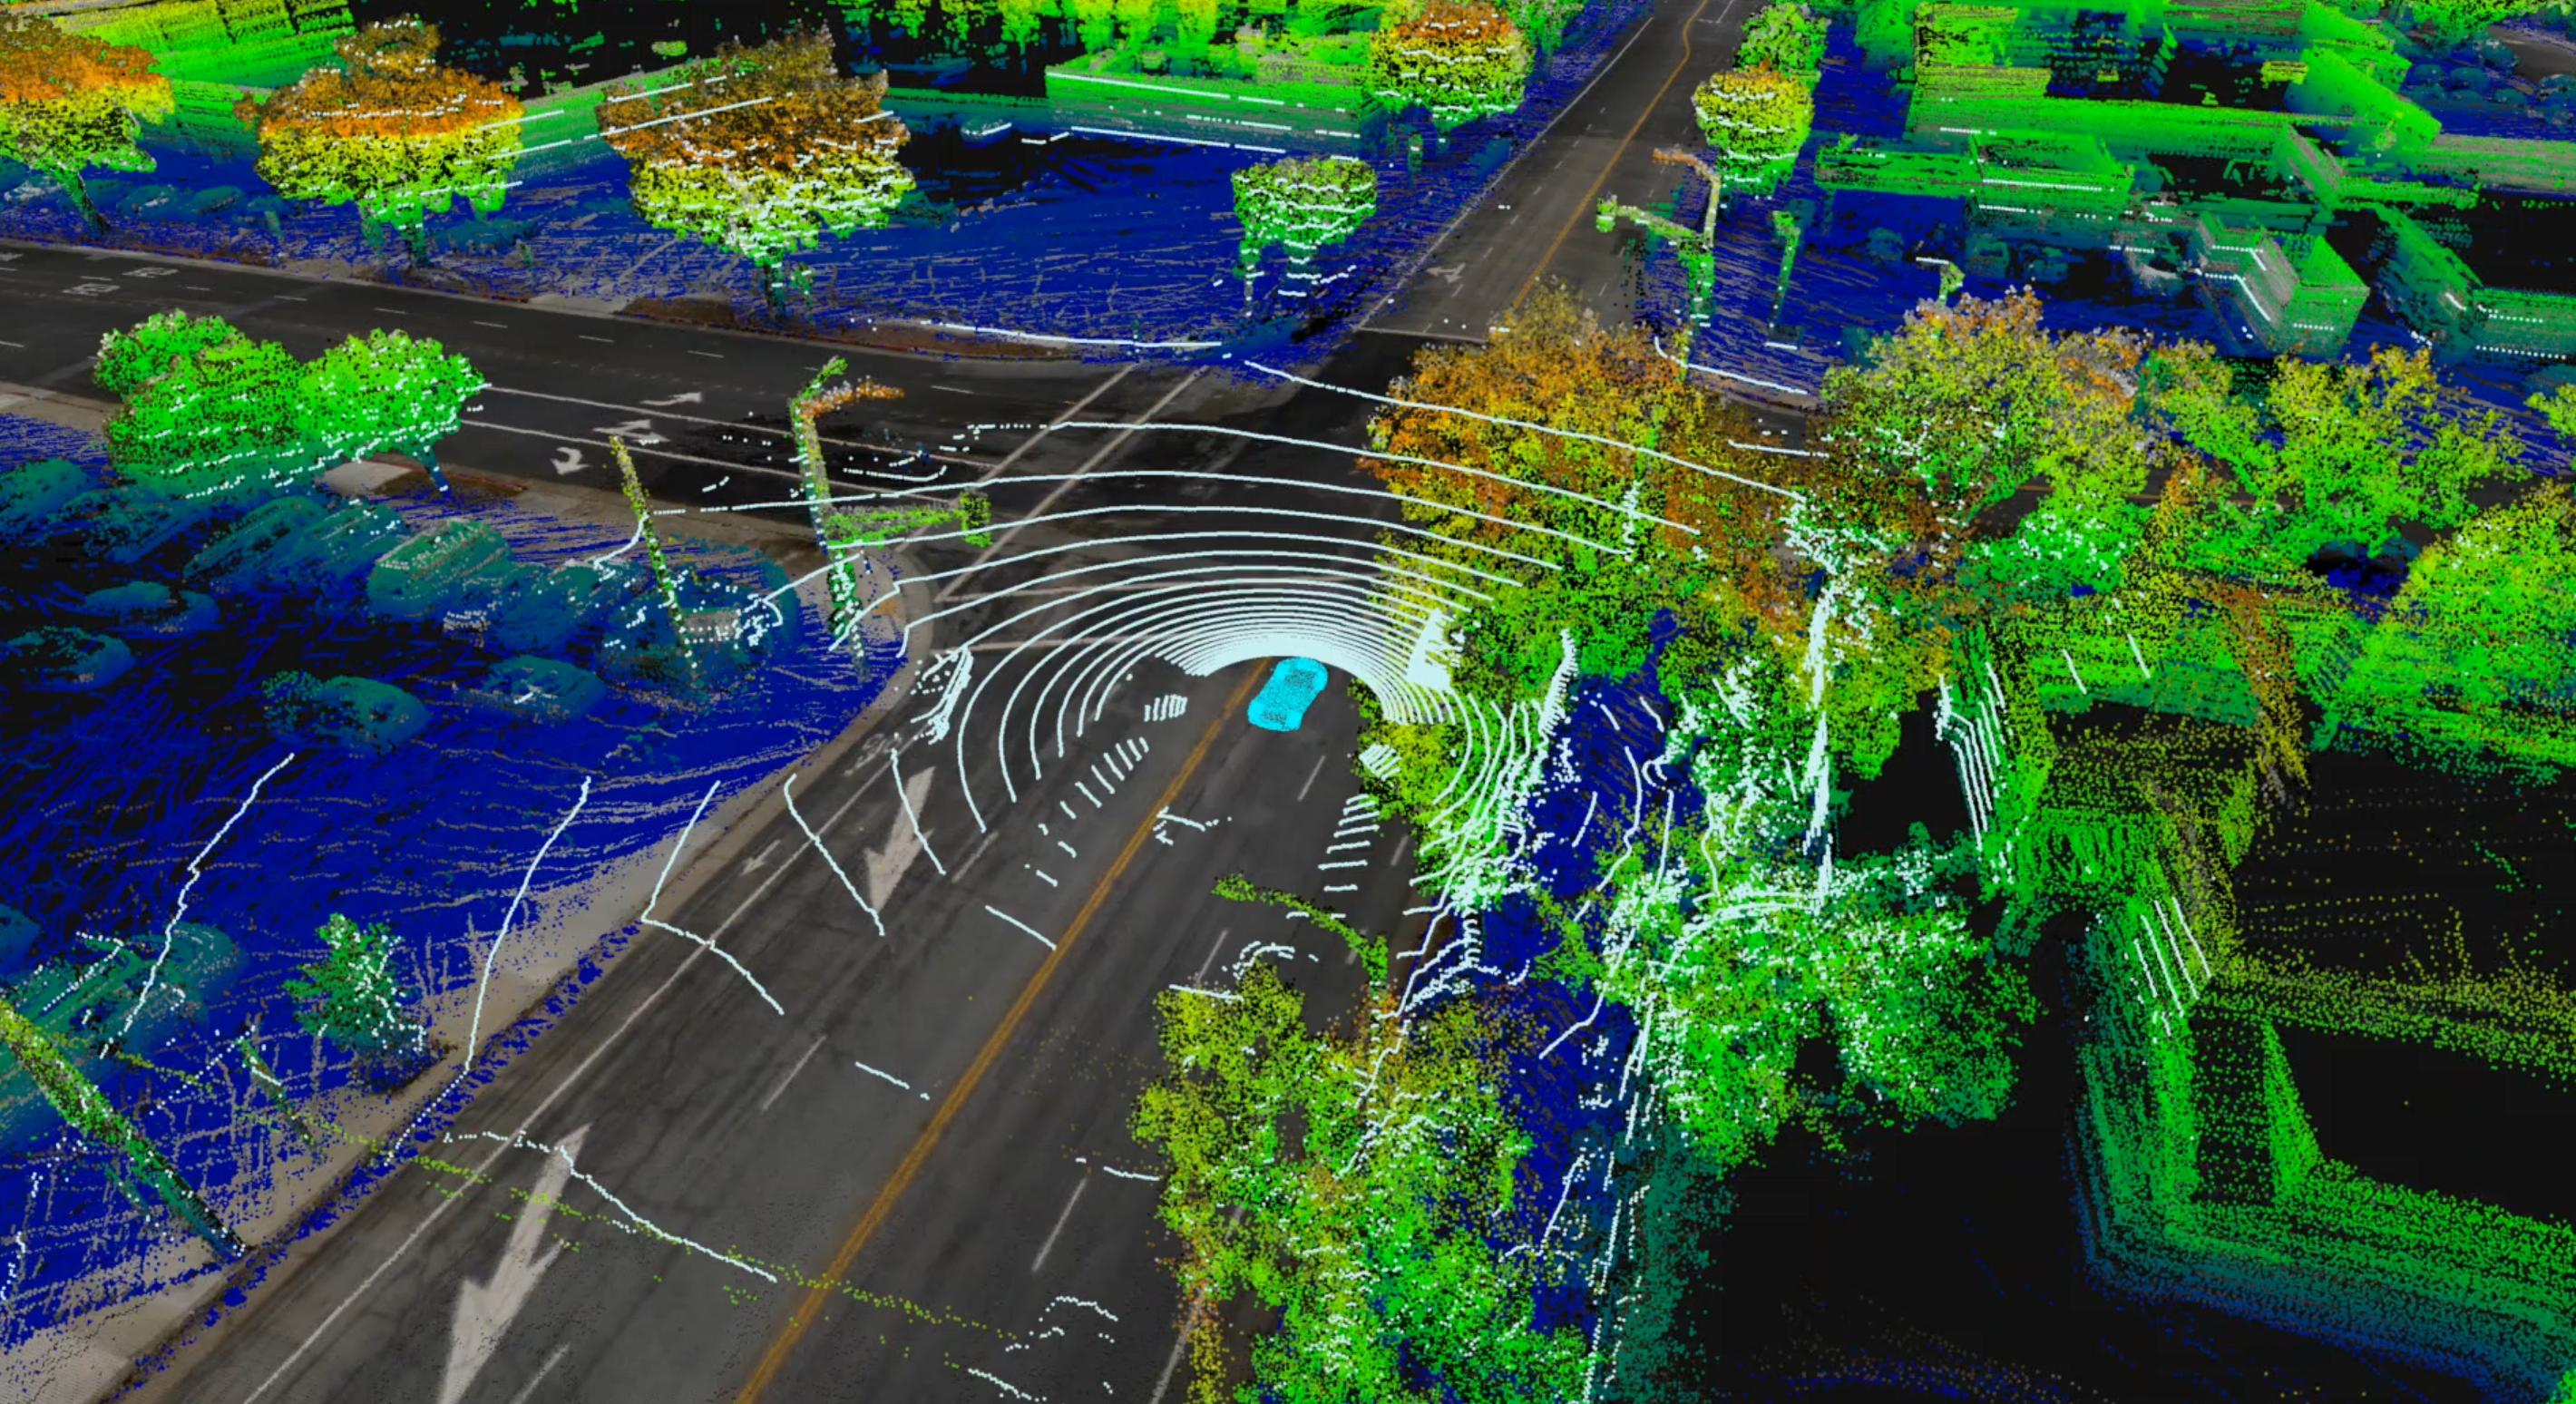 DeepMap HD Maps for Autonomous Vehicles World, Racing